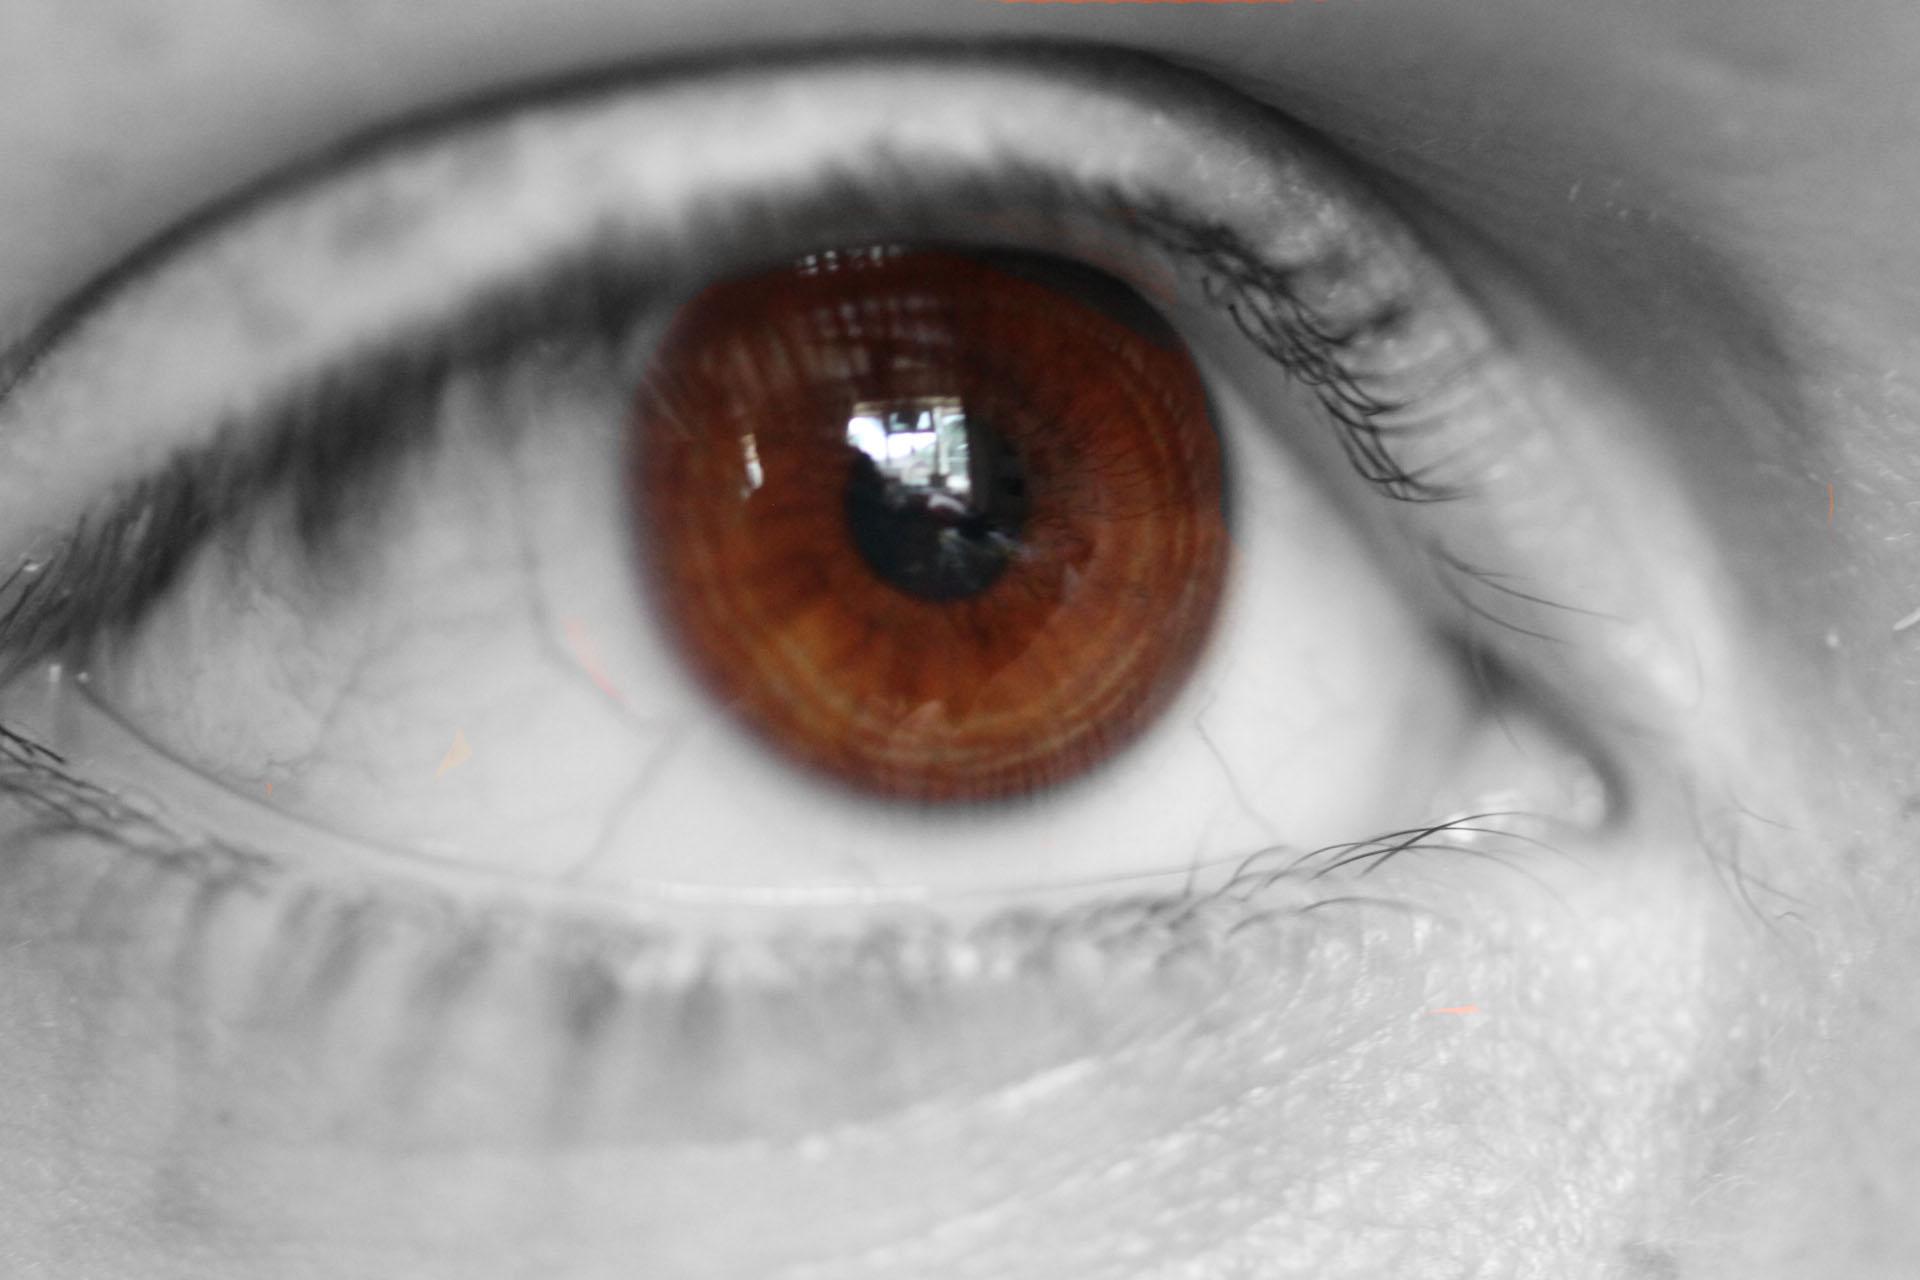 an eye of wonder